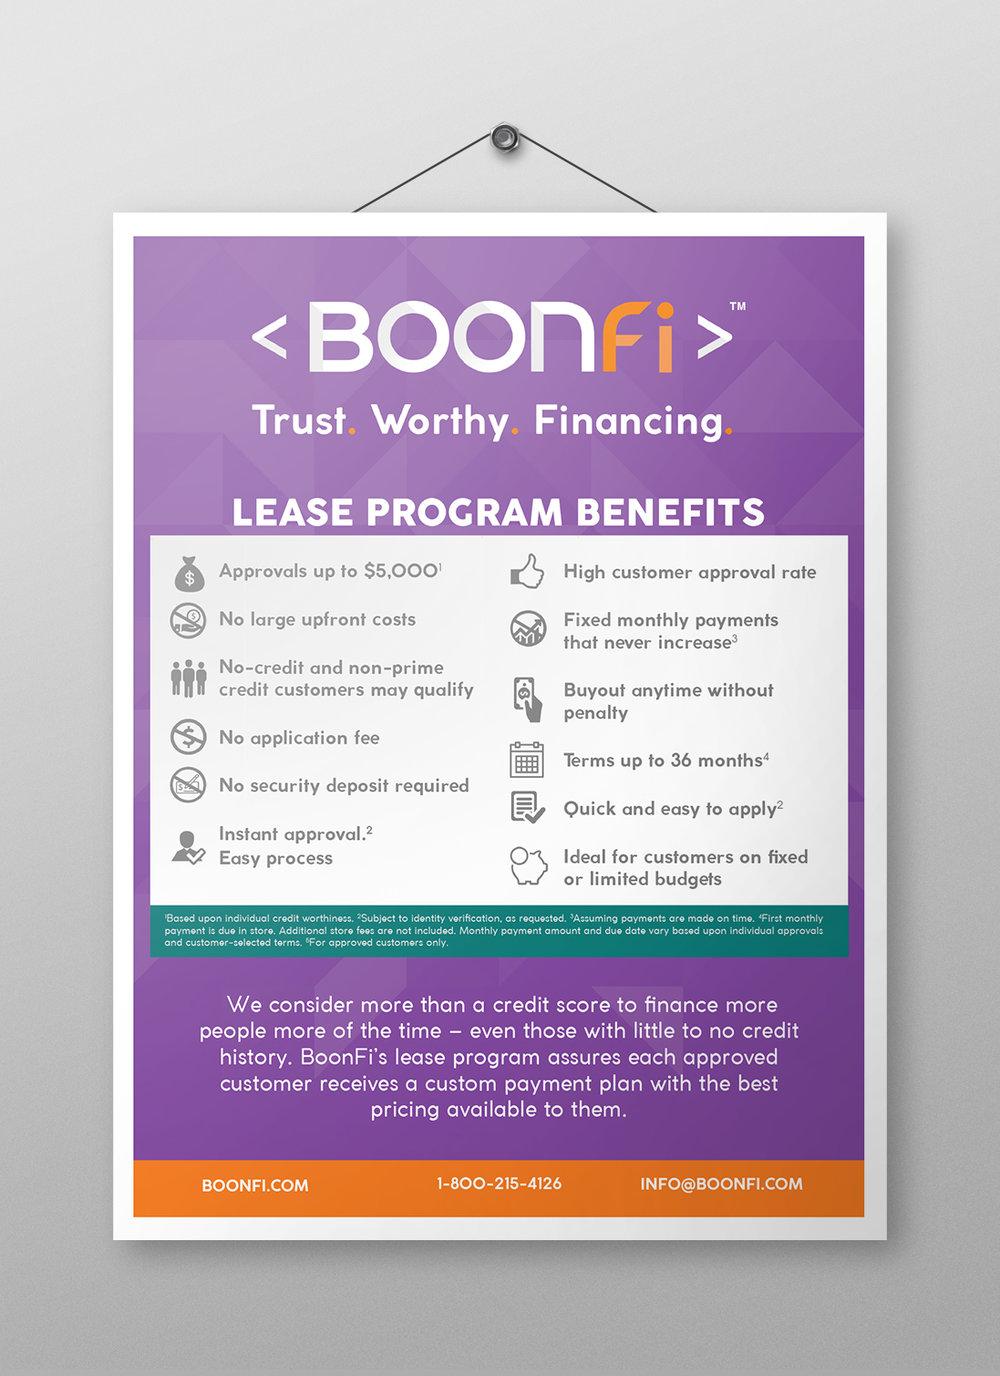 boonfi-branding-poster-graphic-design-company